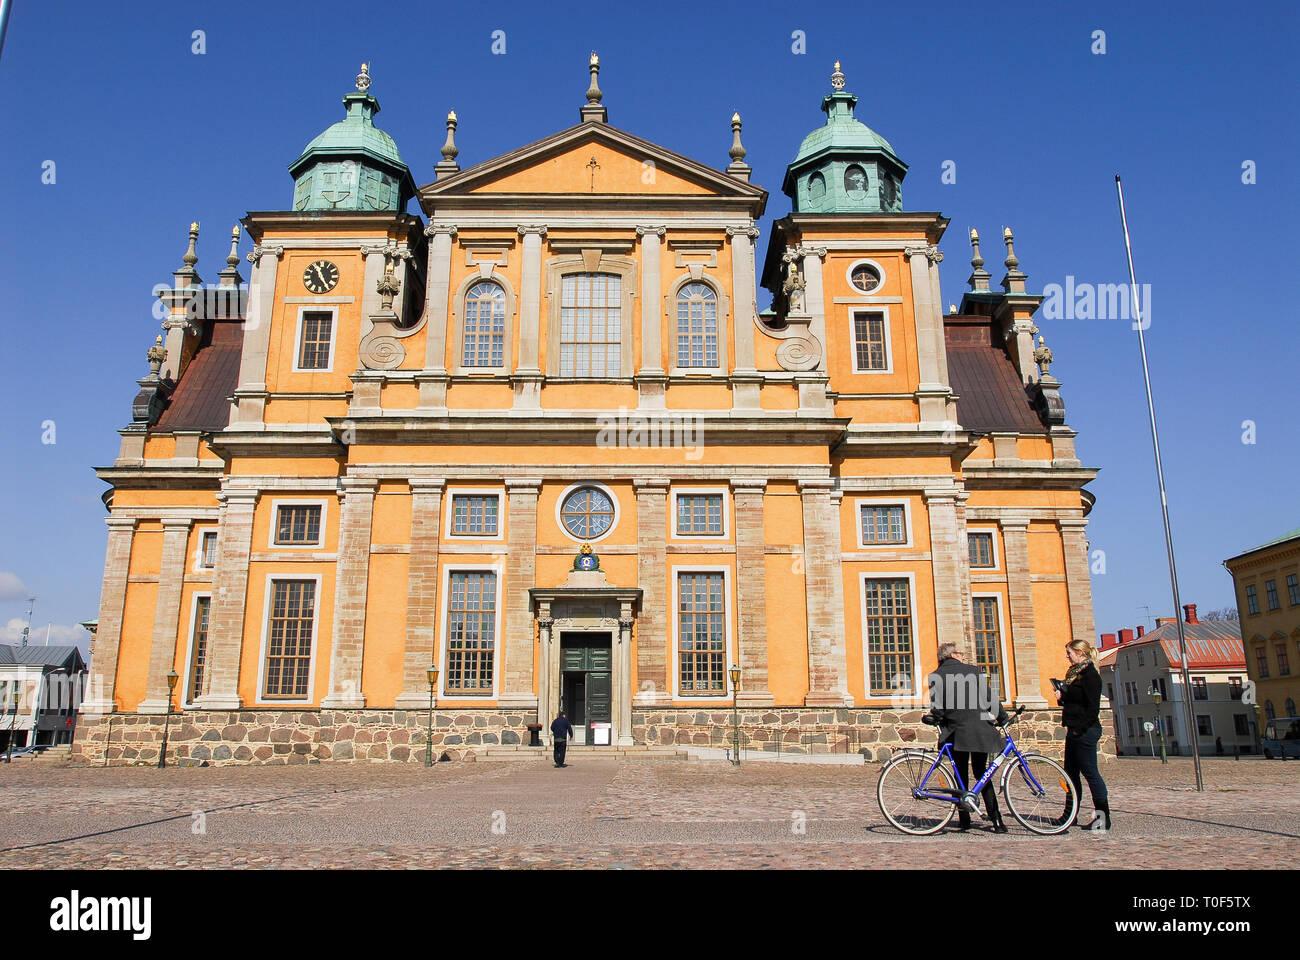 Baroque Kalmar domkyrka (Kalmar Cathedral) built 1660 to 1700 designed by Nicodemus Tessin the Elder on Stortorget in Kalmar, Kalmar County, Sweden. A - Stock Image